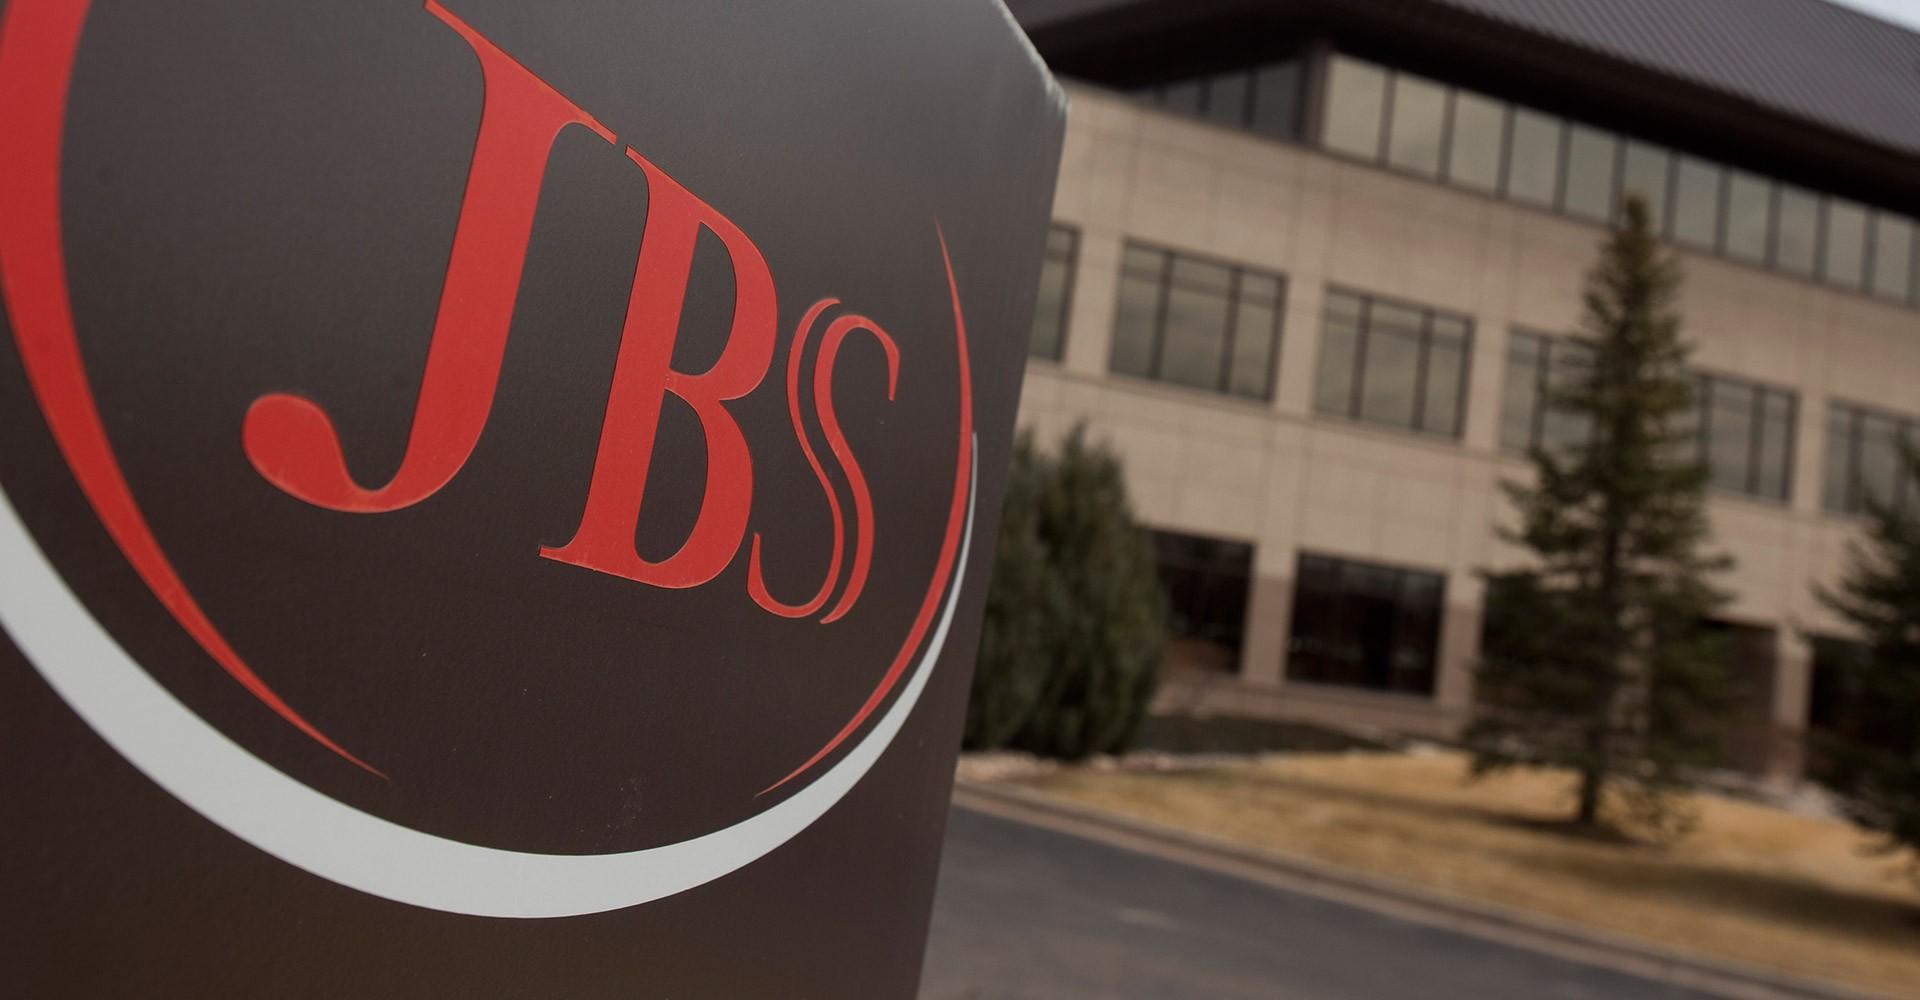 JBS, faturamento